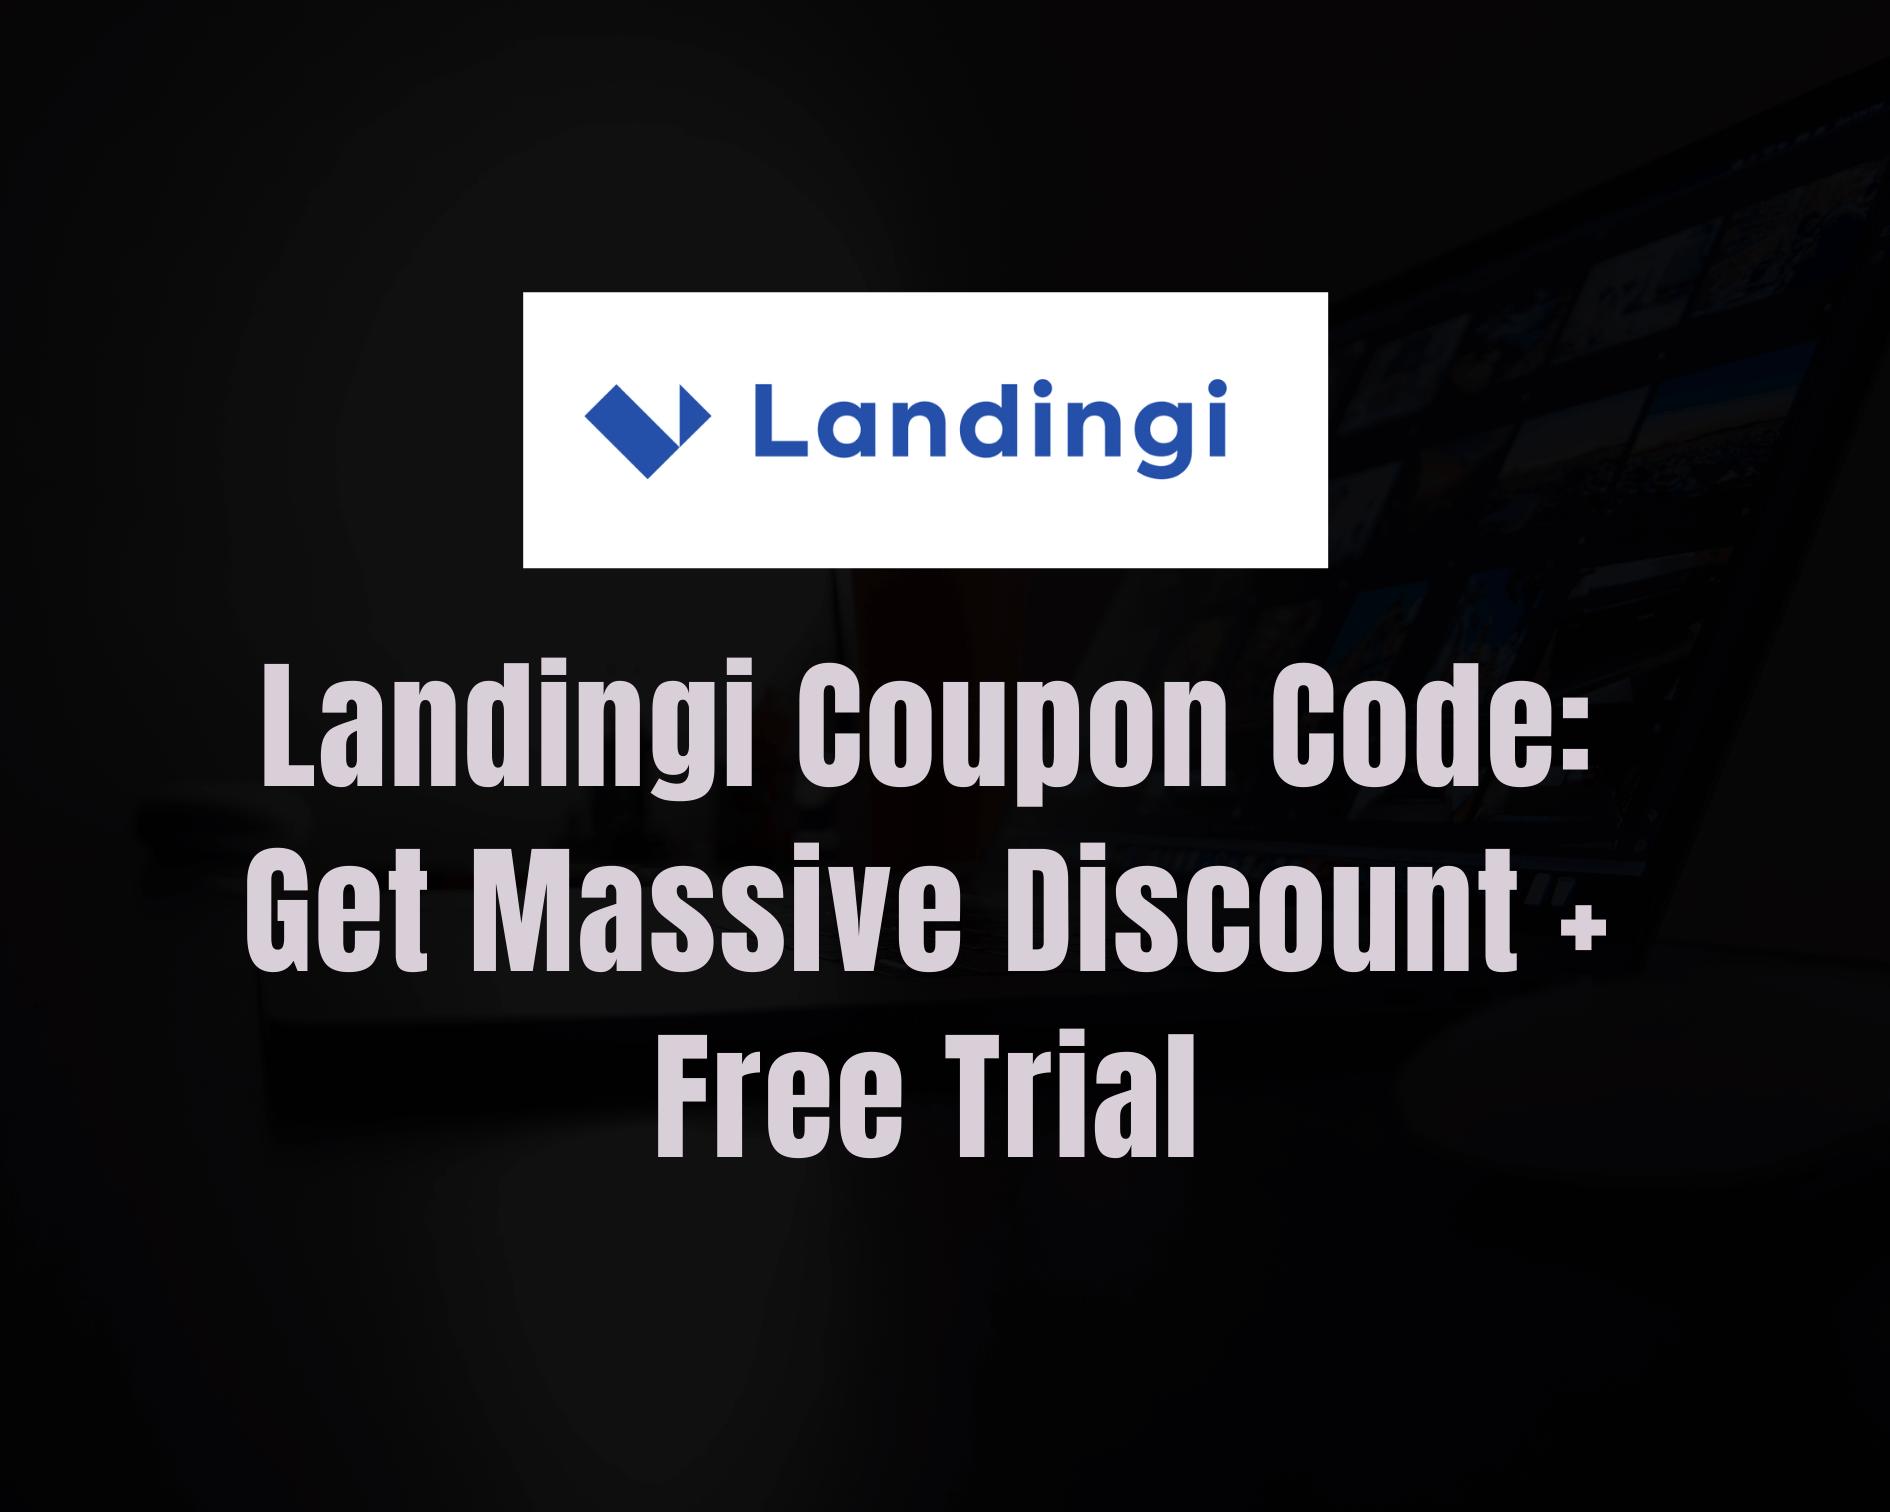 Landingi Coupon Code 2021: Get 38% OFF + Free Trial